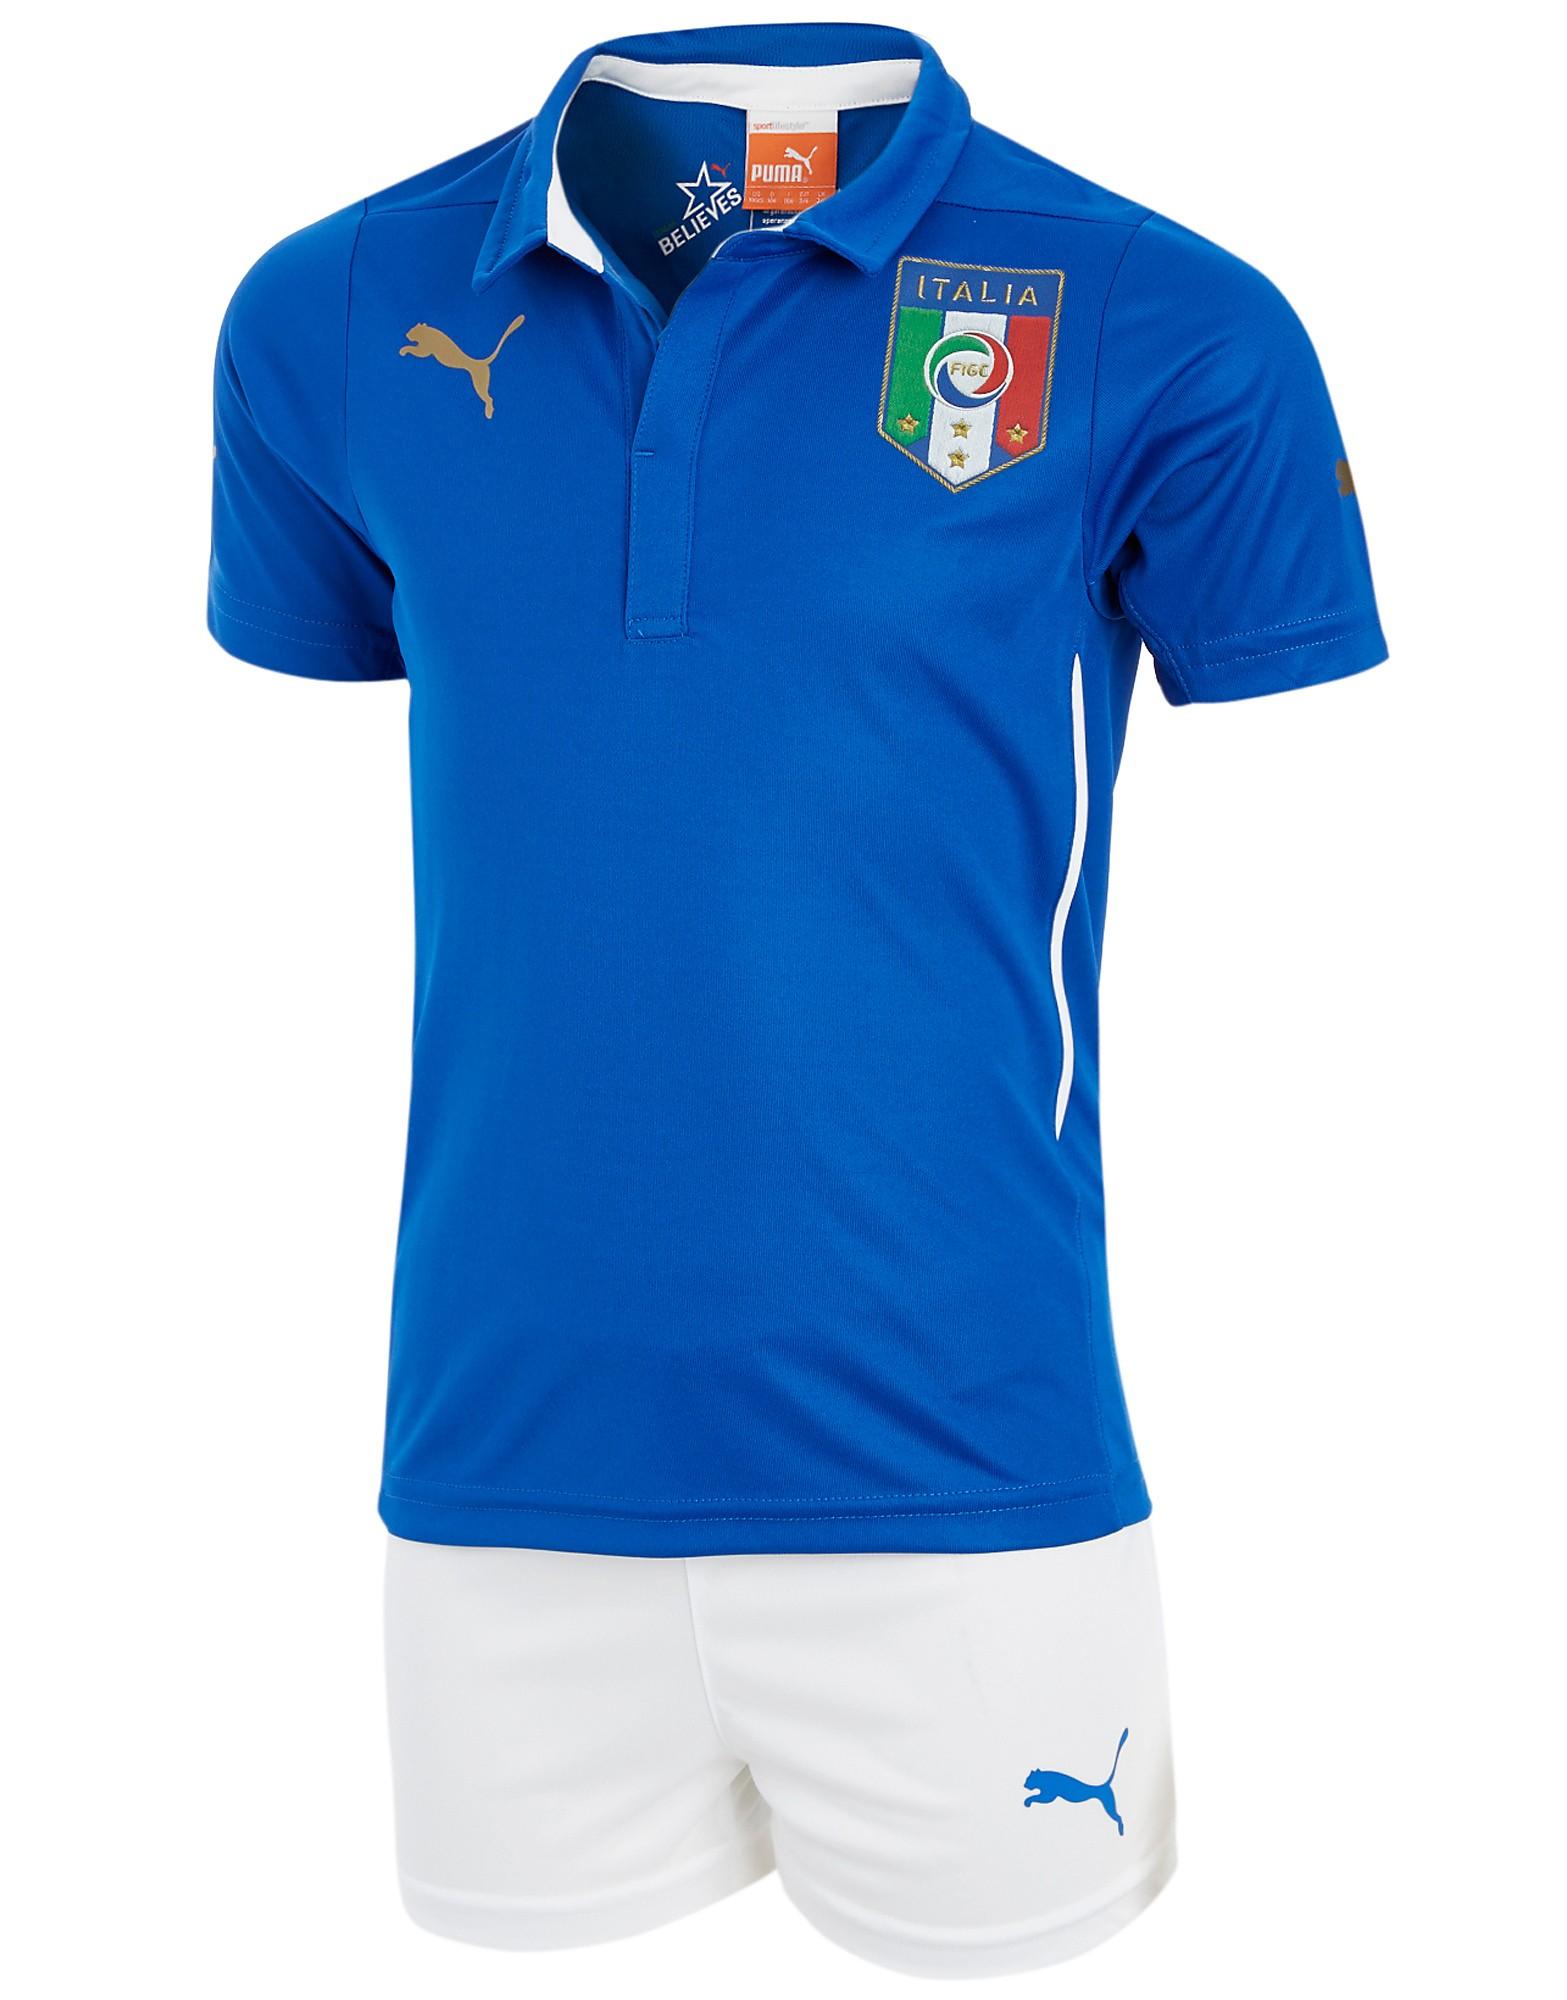 Puma Italy 2014 Childrens Home Kit